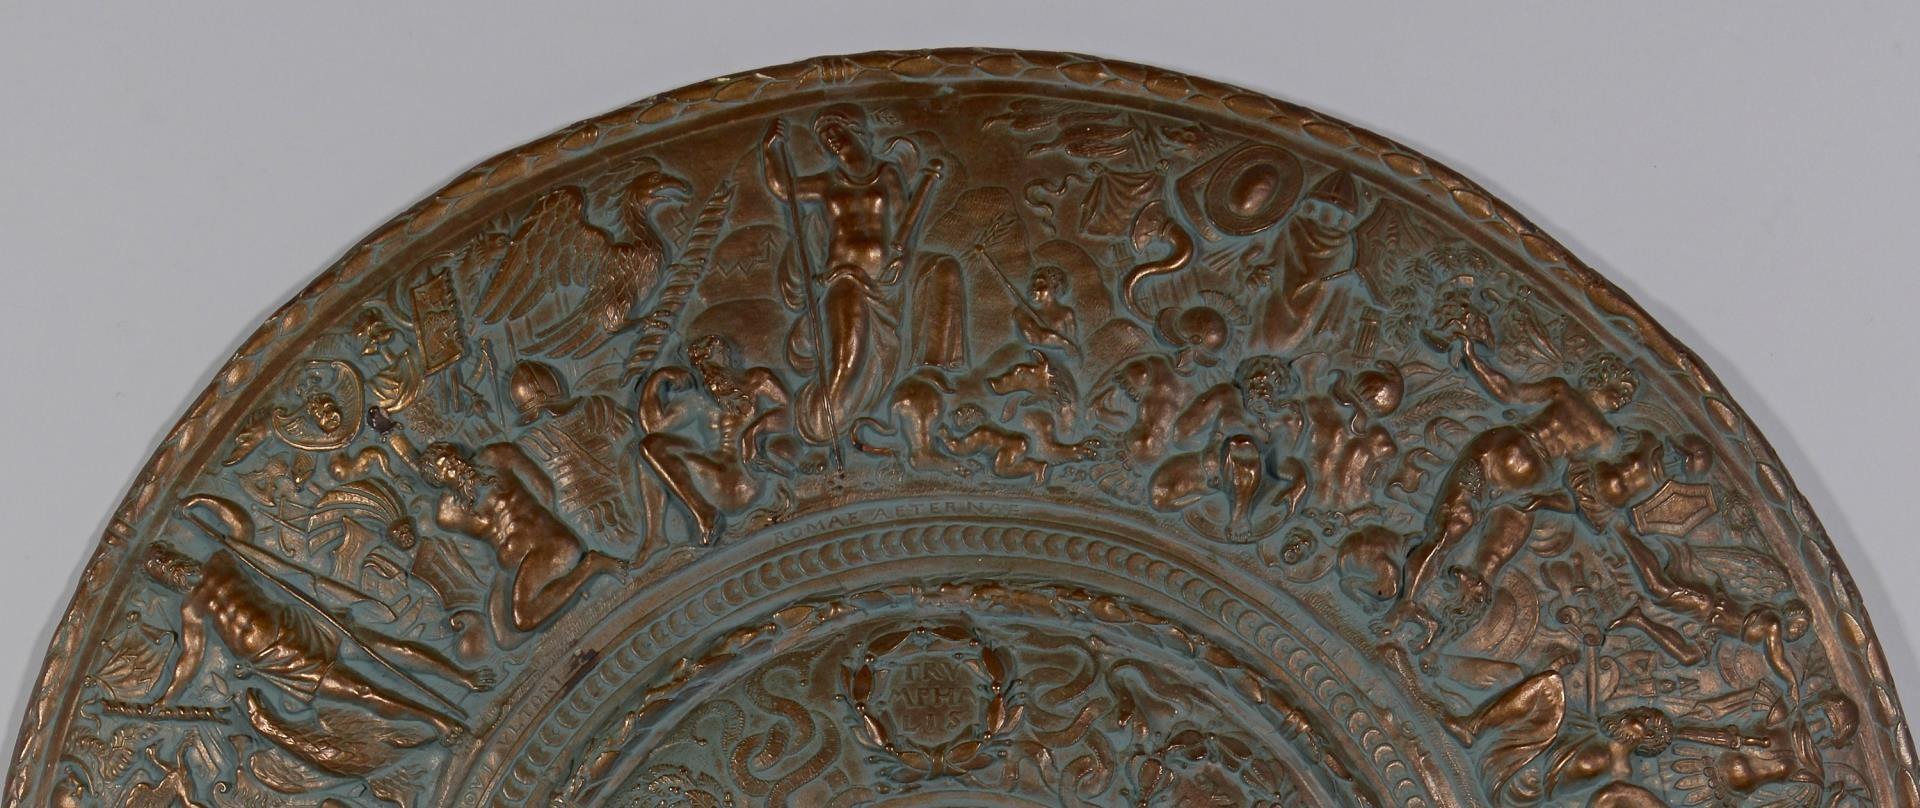 Lot 209: Bronzed Plaster Shield, Sigman